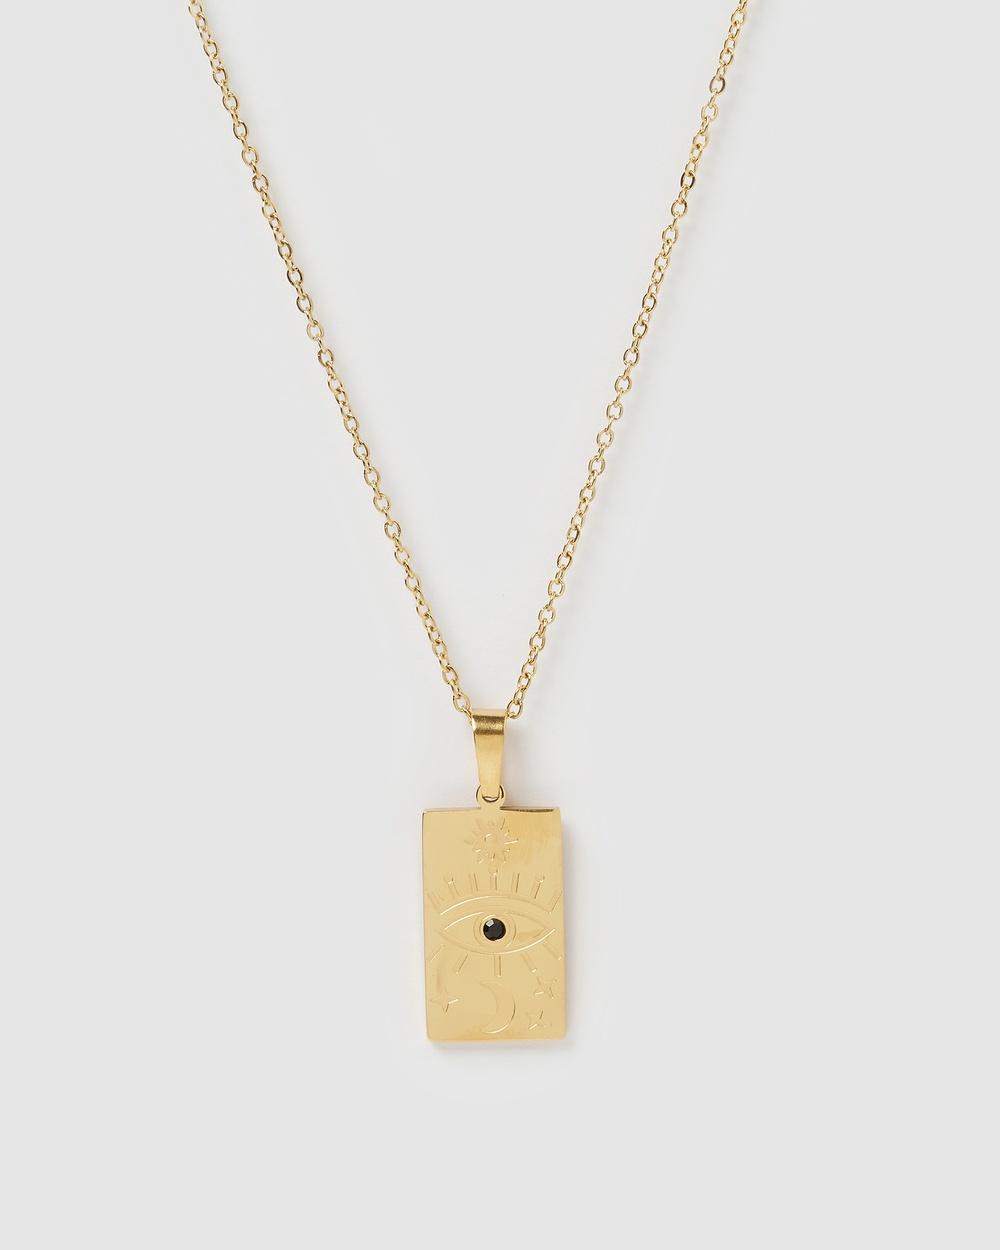 Miz Casa and Co Amelia Pendant Necklace Jewellery Gold